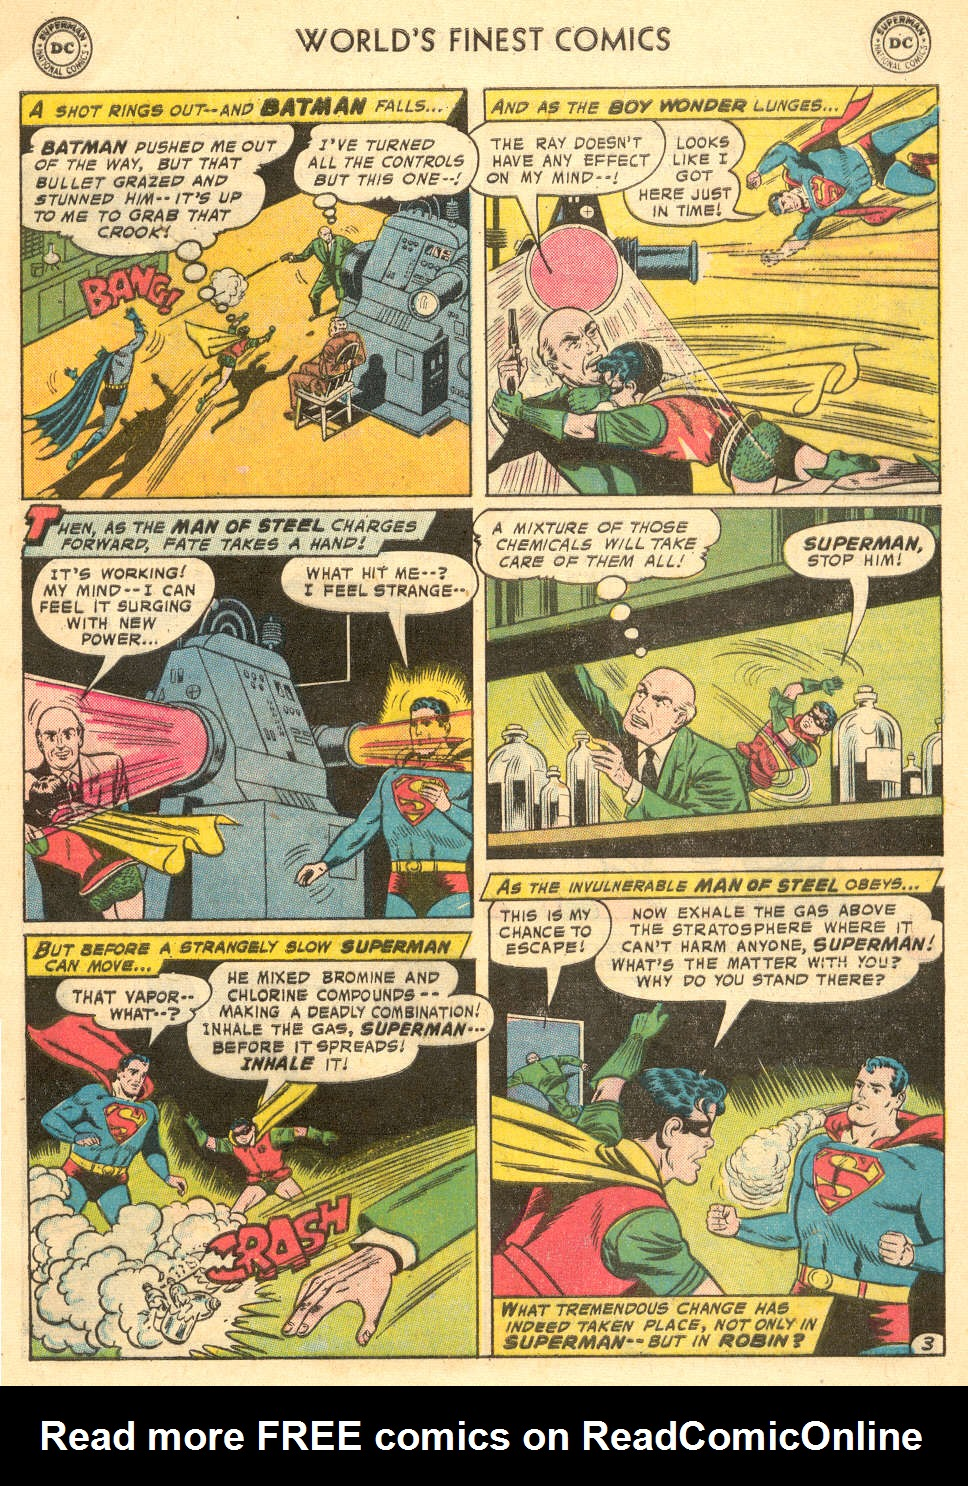 Read online World's Finest Comics comic -  Issue #93 - 5